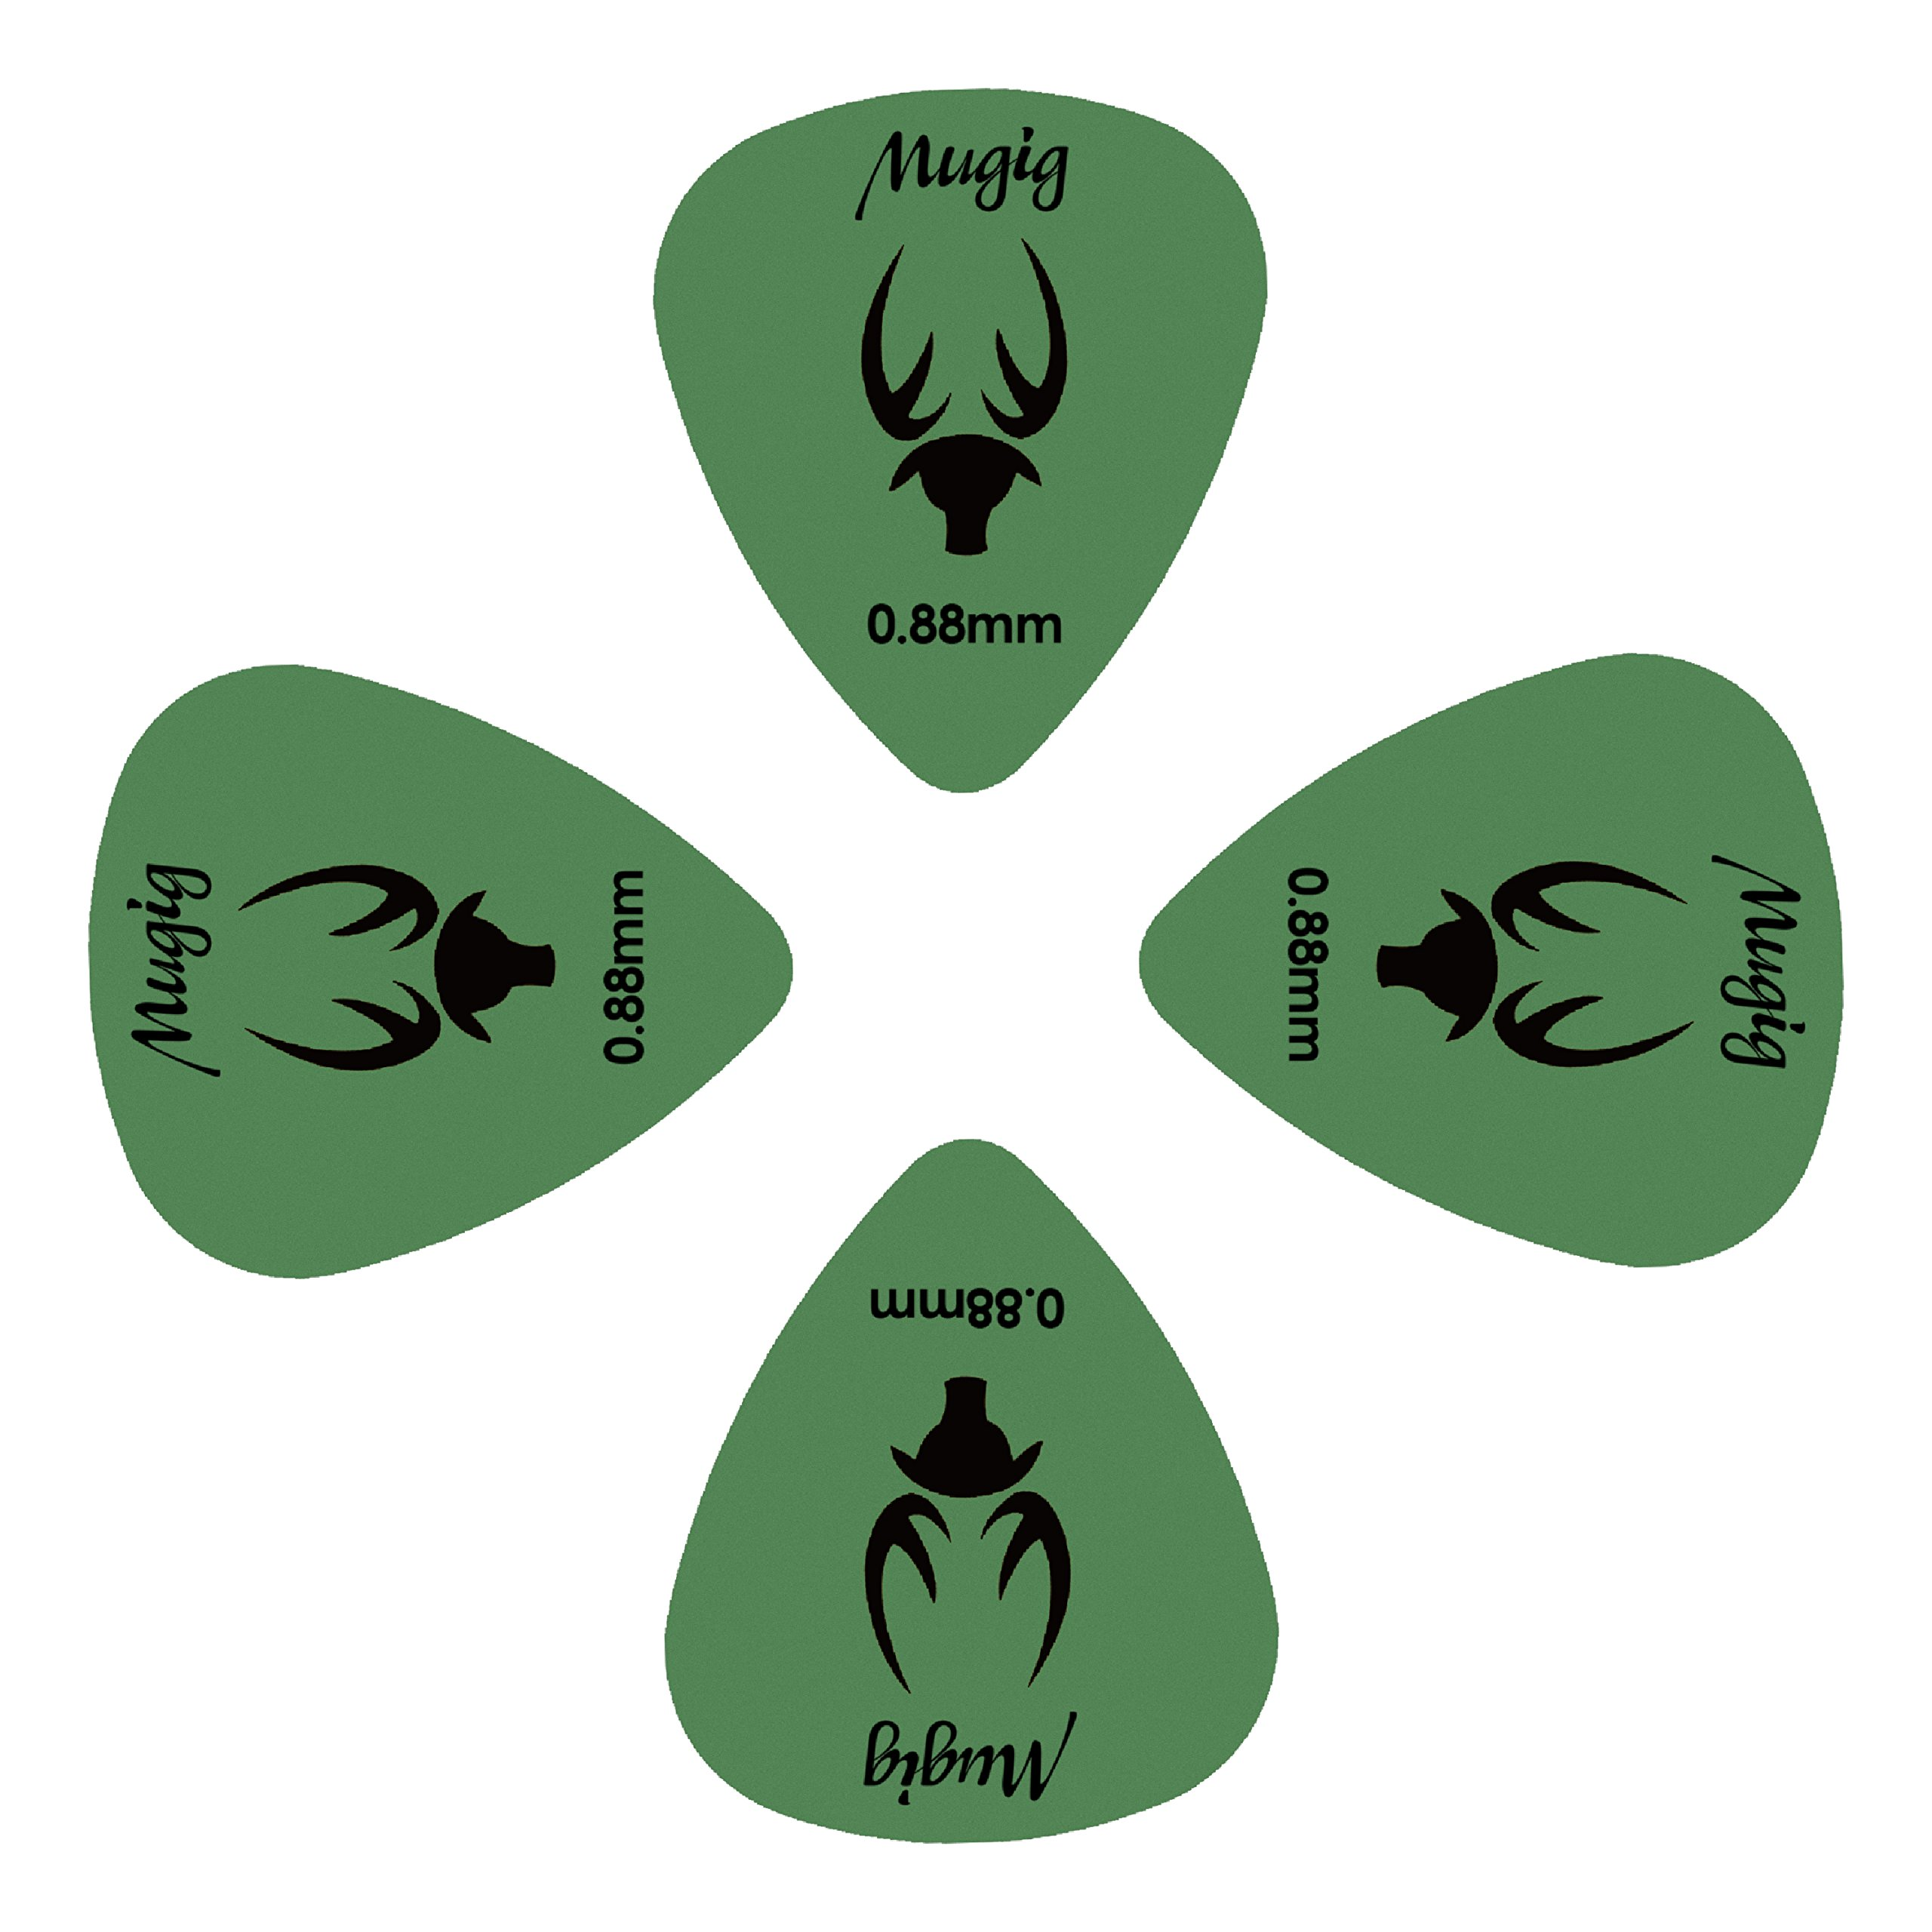 Mugig Gitarre Plektren Plektron bunte Picks 50 Stück 0.88mm für E-, Akustik- und Bass-Gitarre (0.88mm)